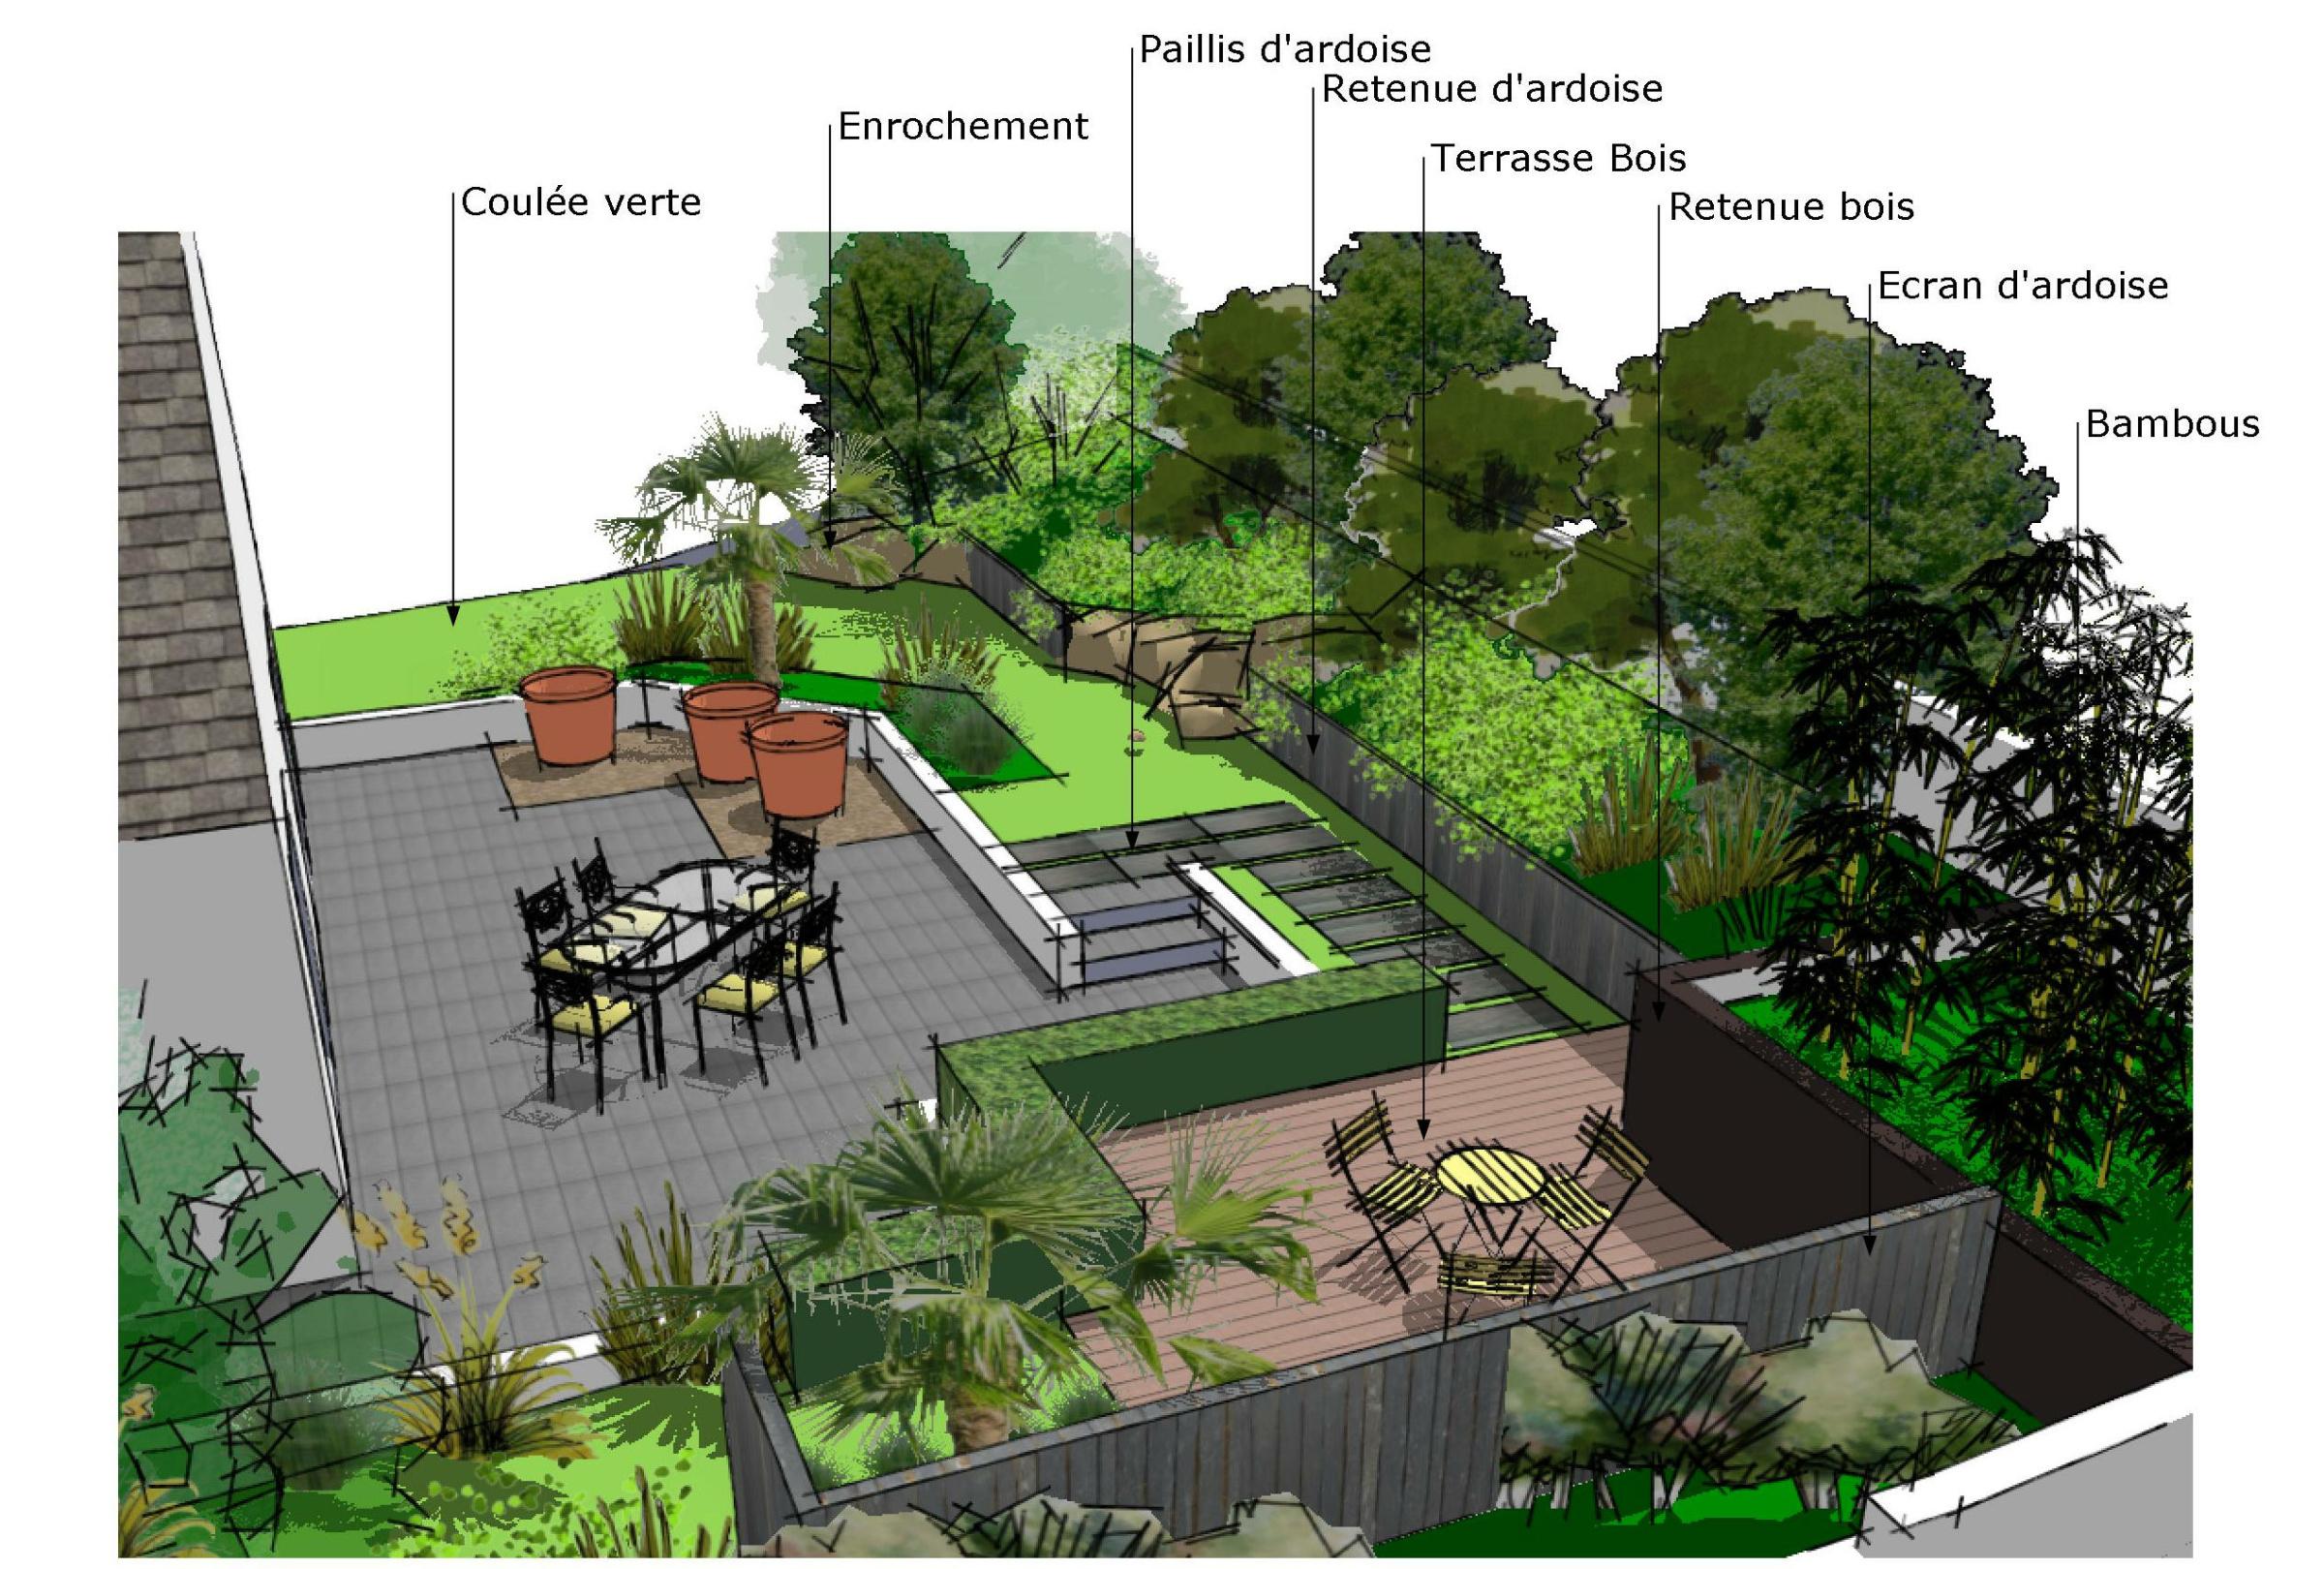 Aménagement D'un Petit Jardin - 2011 - Auray - Maezad ... pour Aménagement De Petit Jardin